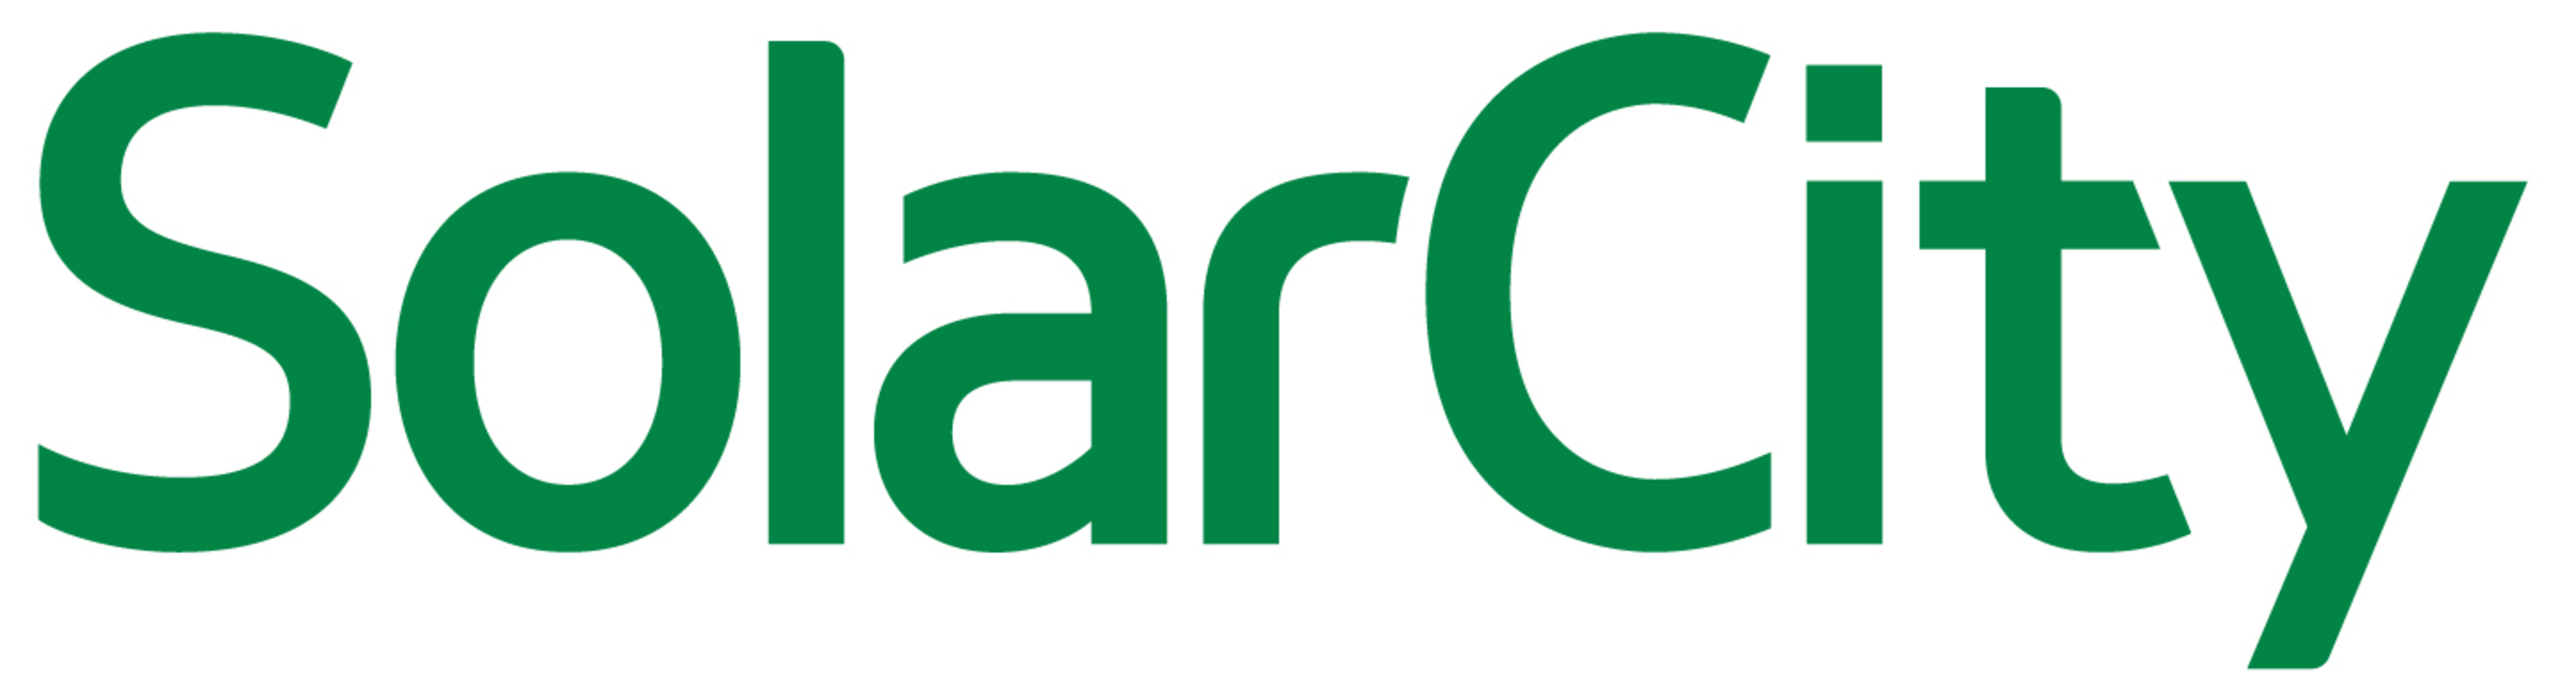 SolarCity logo.